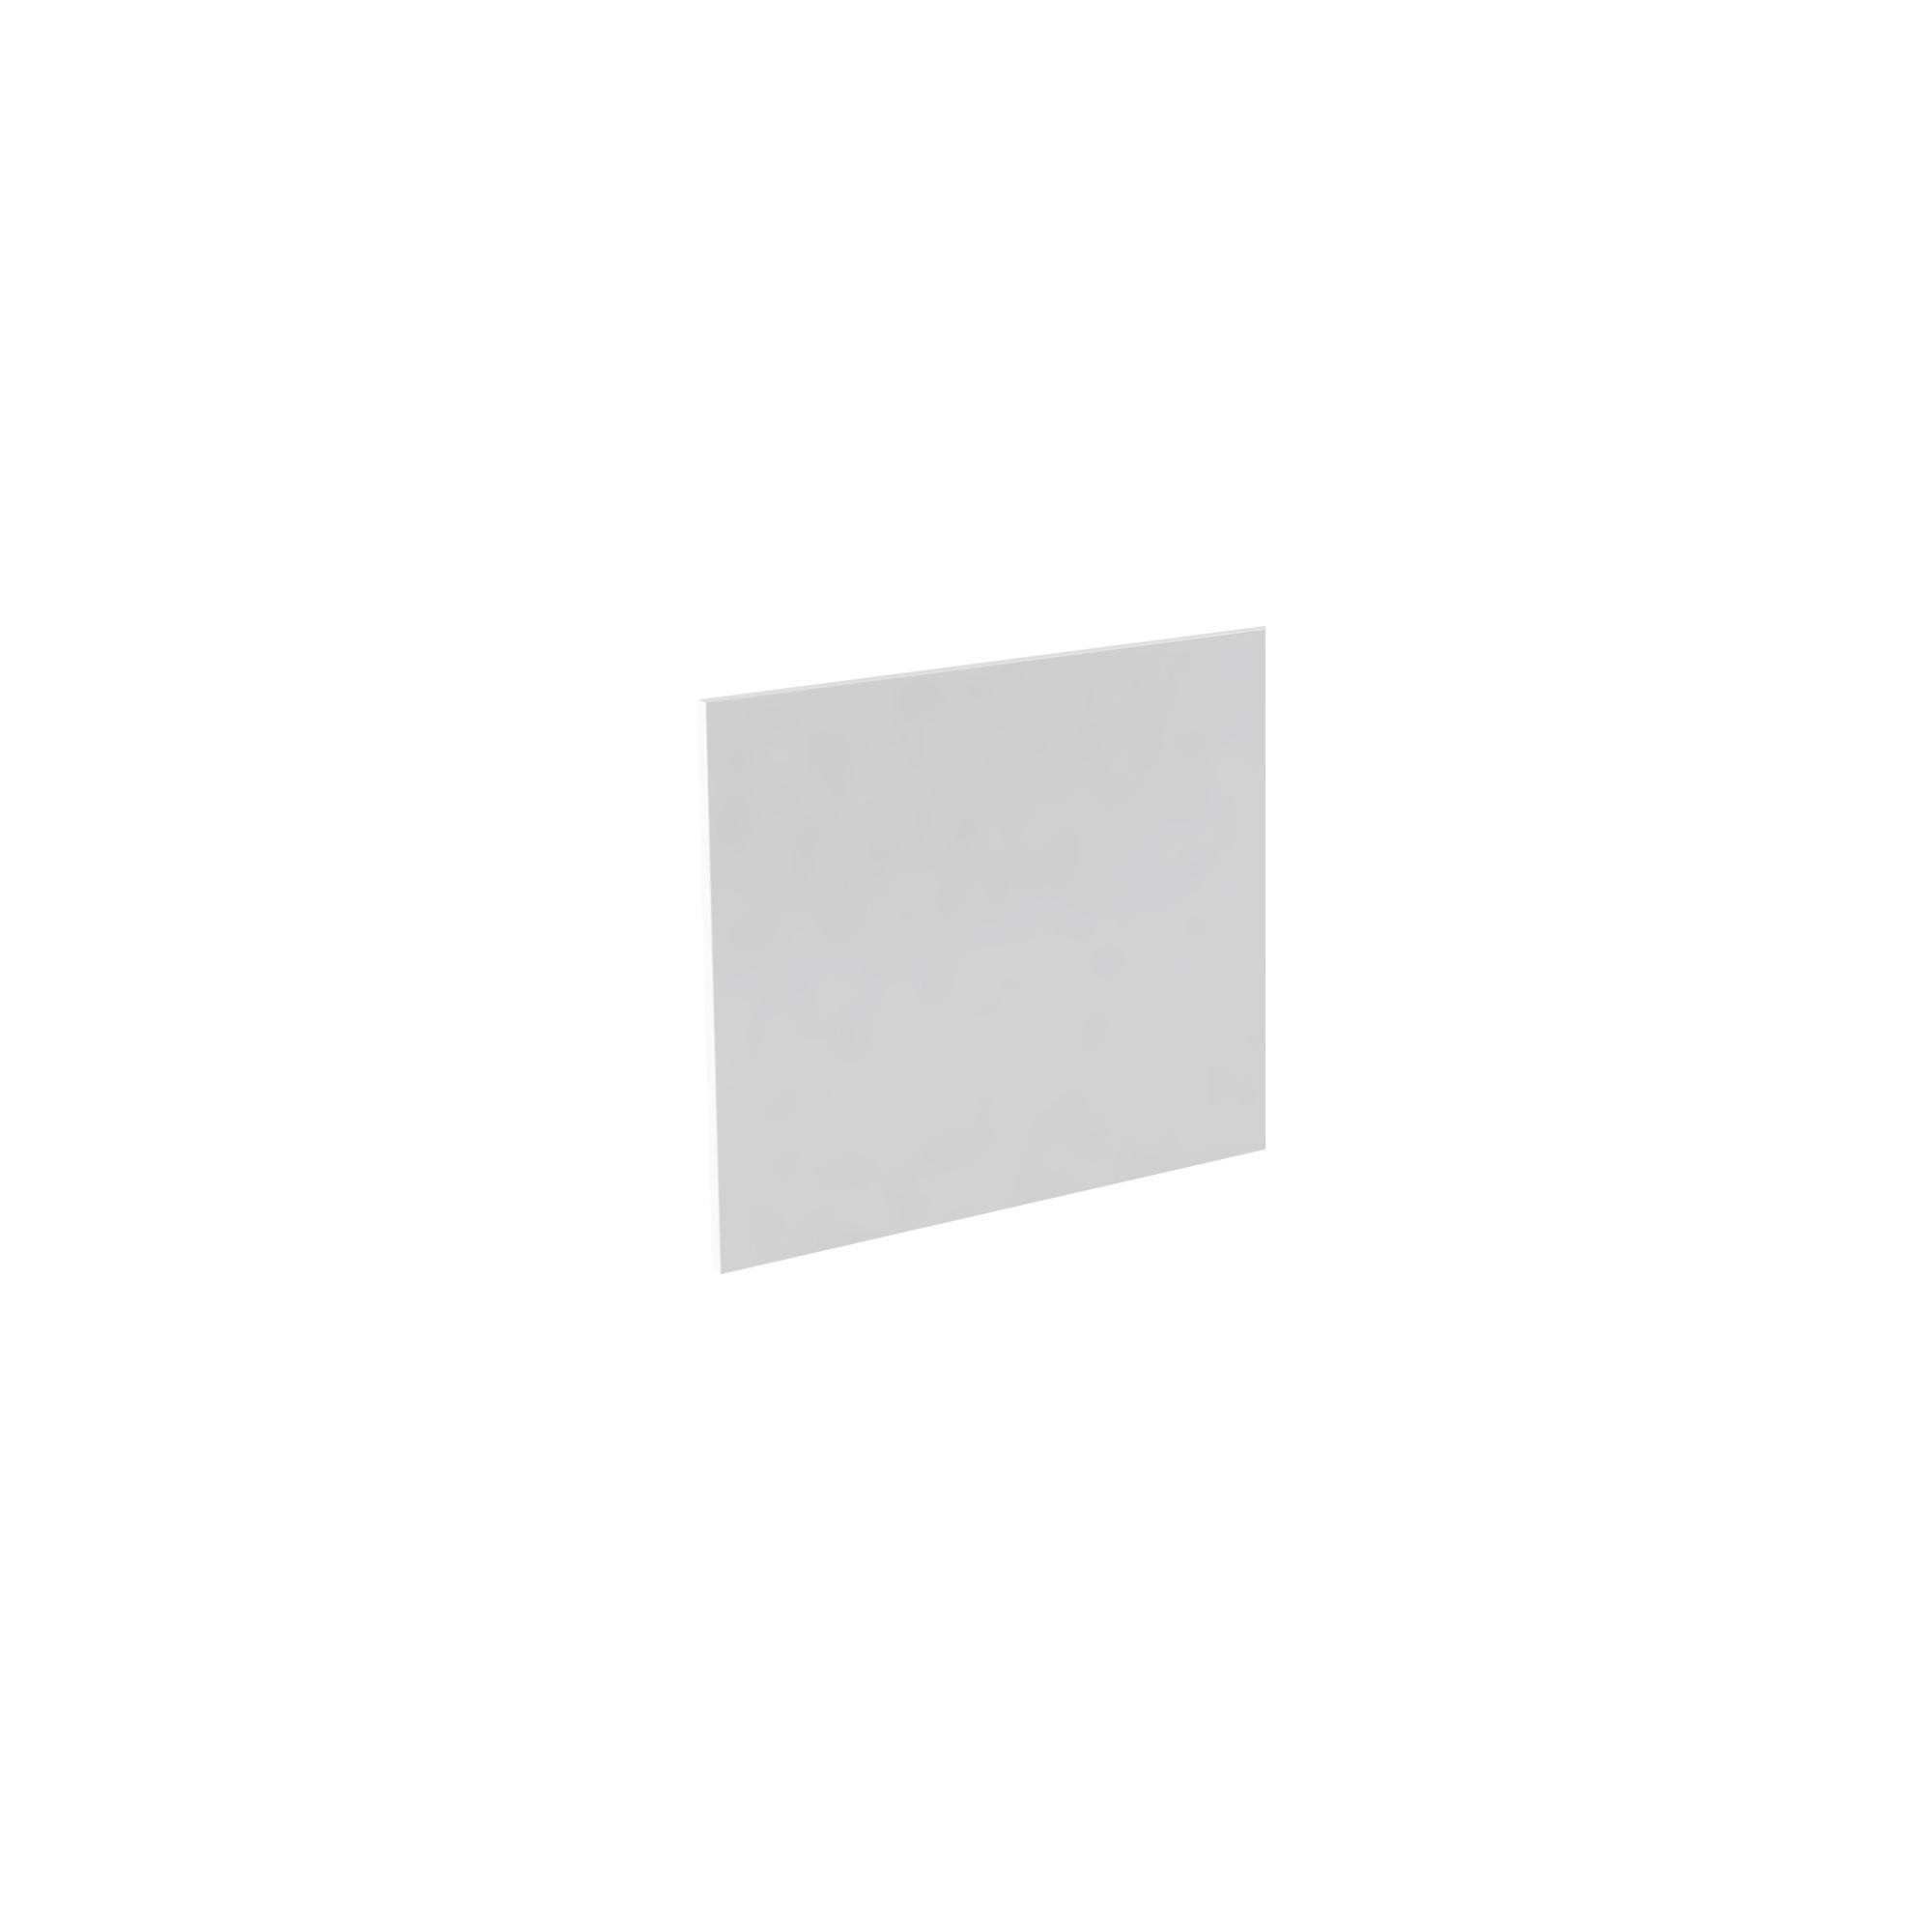 K-Vit Ikon 700mm Bath Panel - White